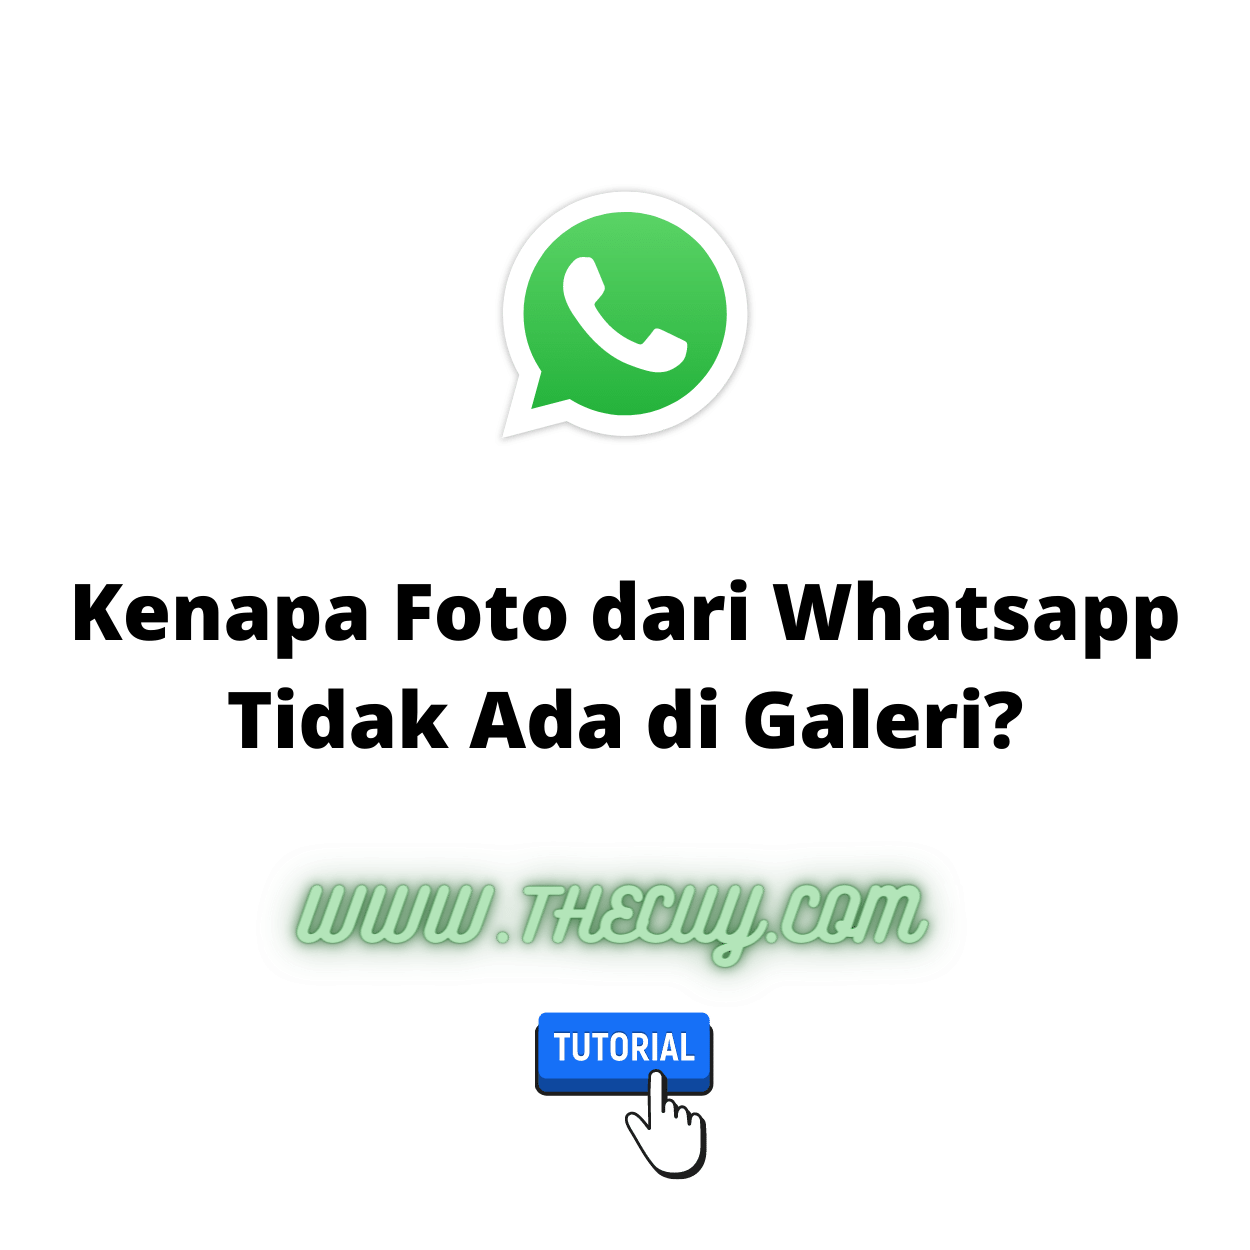 Kenapa Foto dari Whatsapp Tidak Ada di Galeri?